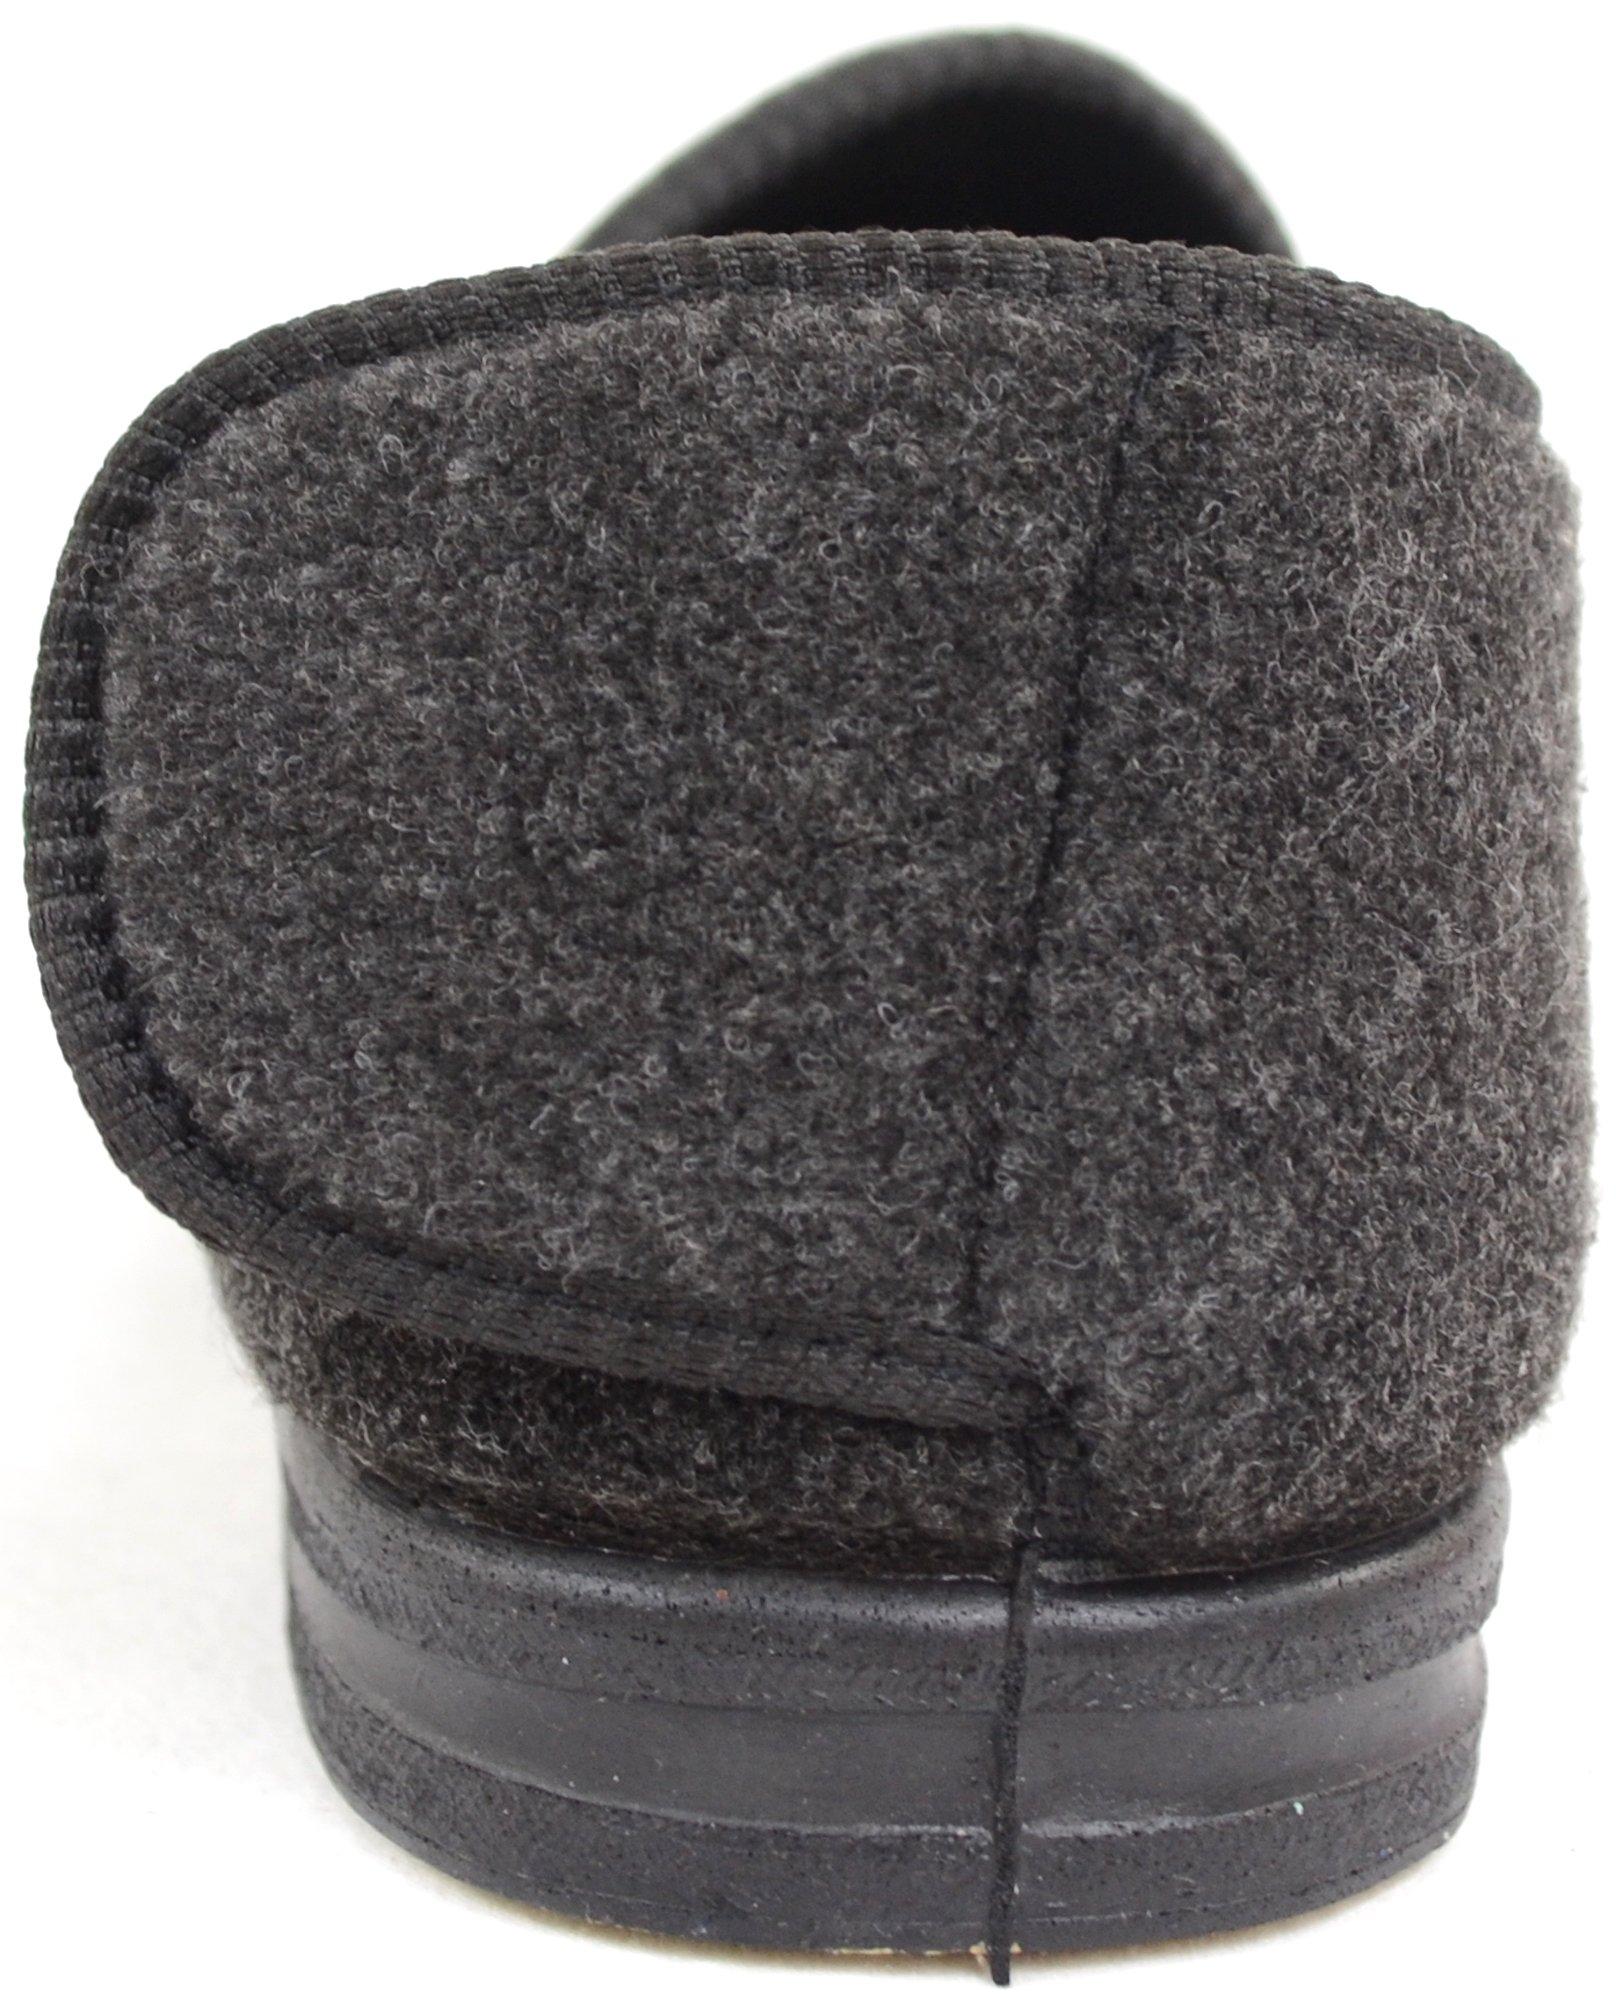 ABSOLUTE FOOTWEAR Mens Orthopaedic/Extra Wide Fit Adjustable Slipper Boot/Slippers - Grey - 10 US by ABSOLUTE FOOTWEAR (Image #3)